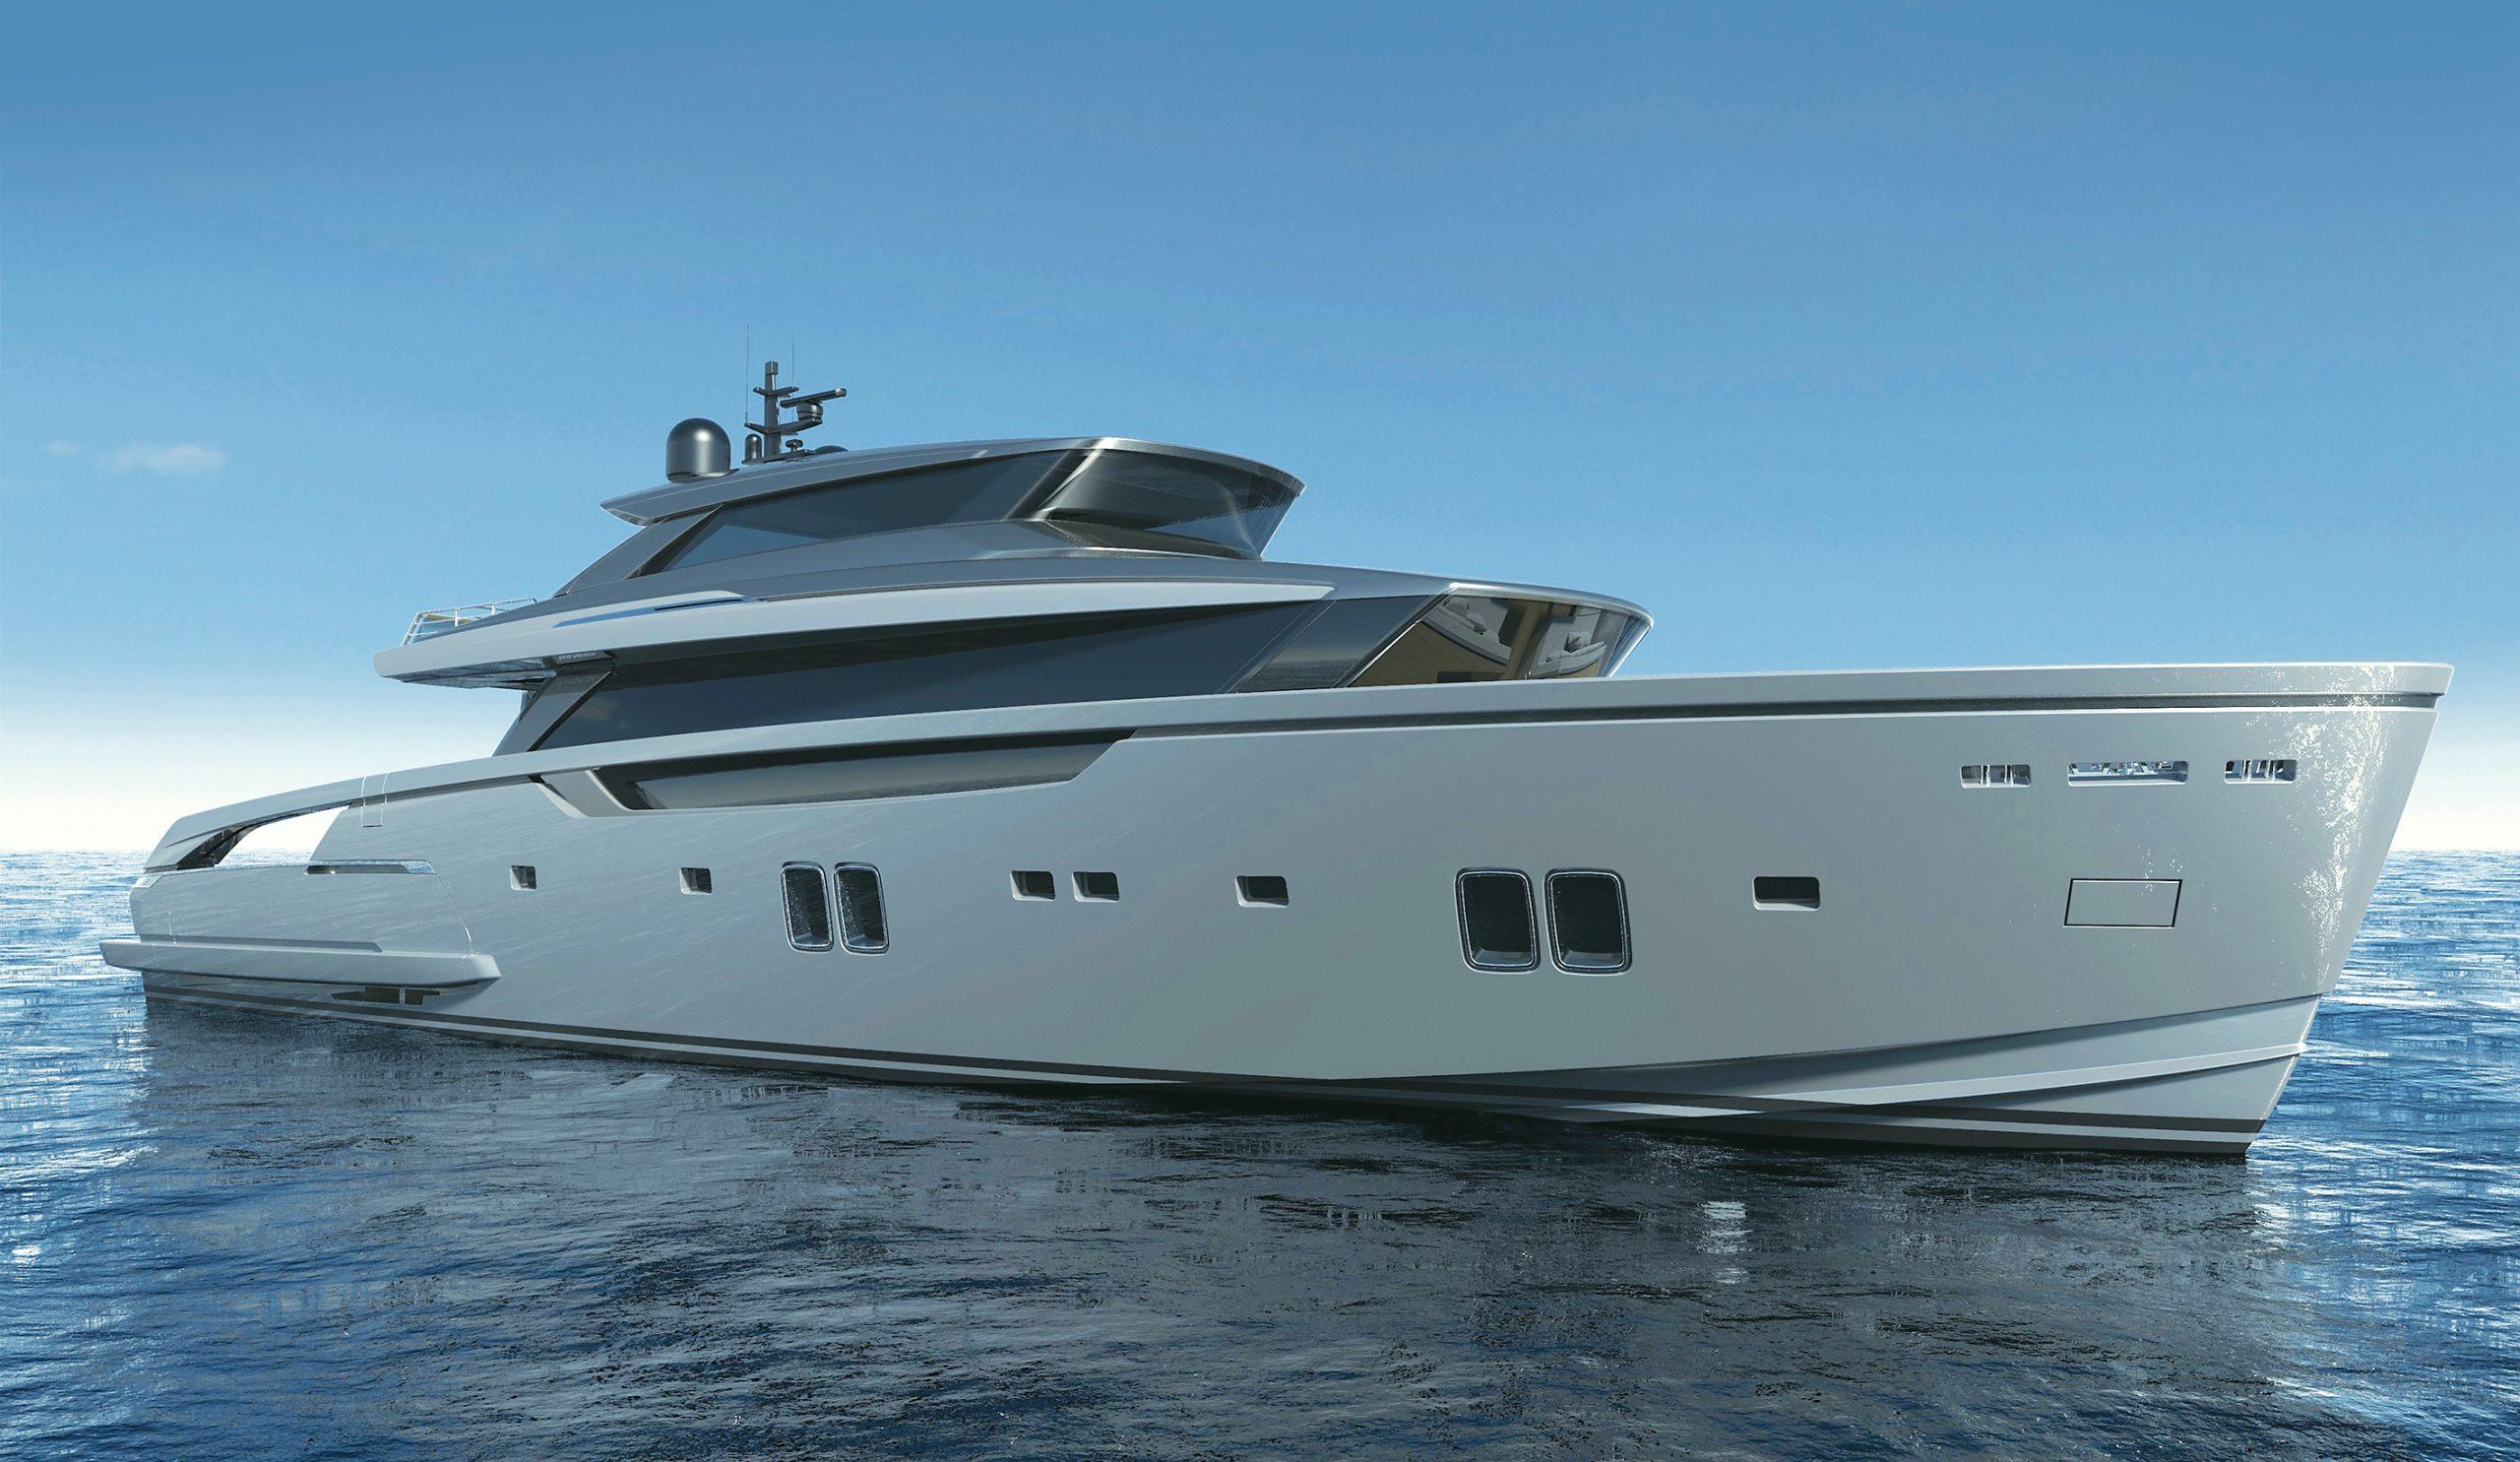 Salon nautique de Sanlorenzo-sx112-new-yachts-outdoor-hero-Palm Beach